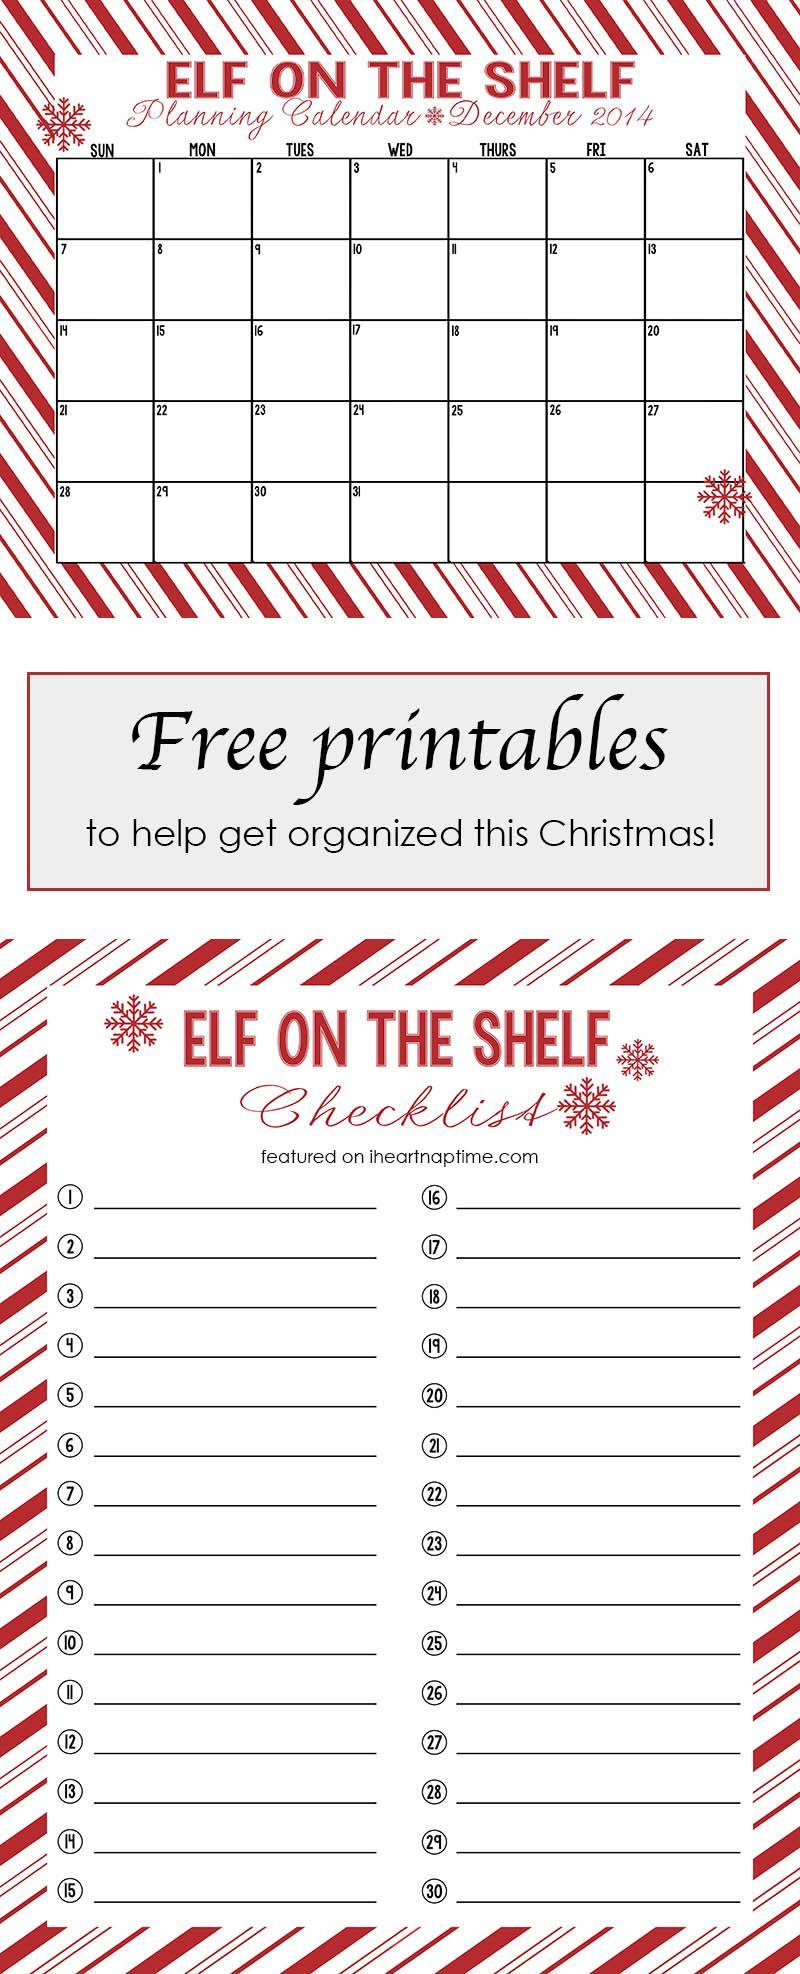 Free Printable Elf On The Shelf Calendar And Checklist  I'Ll Need